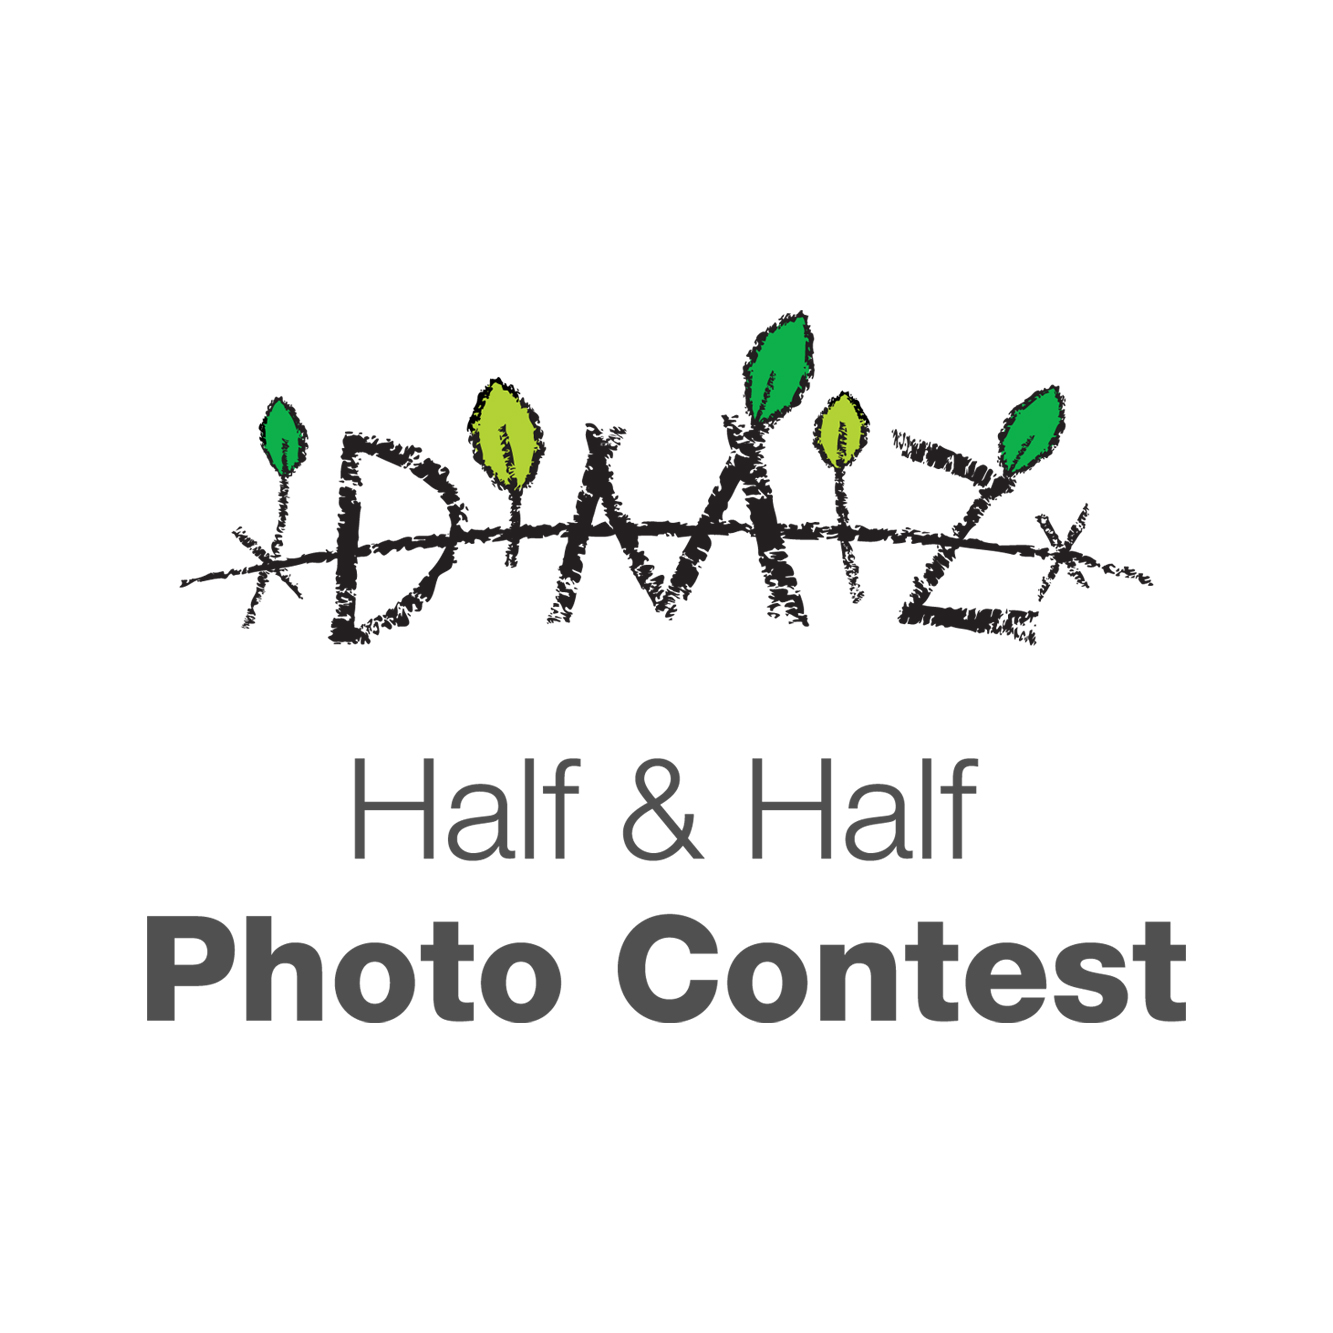 DMZ Half&Half Photo Contest by Gyeonggi Province of Korea - logo